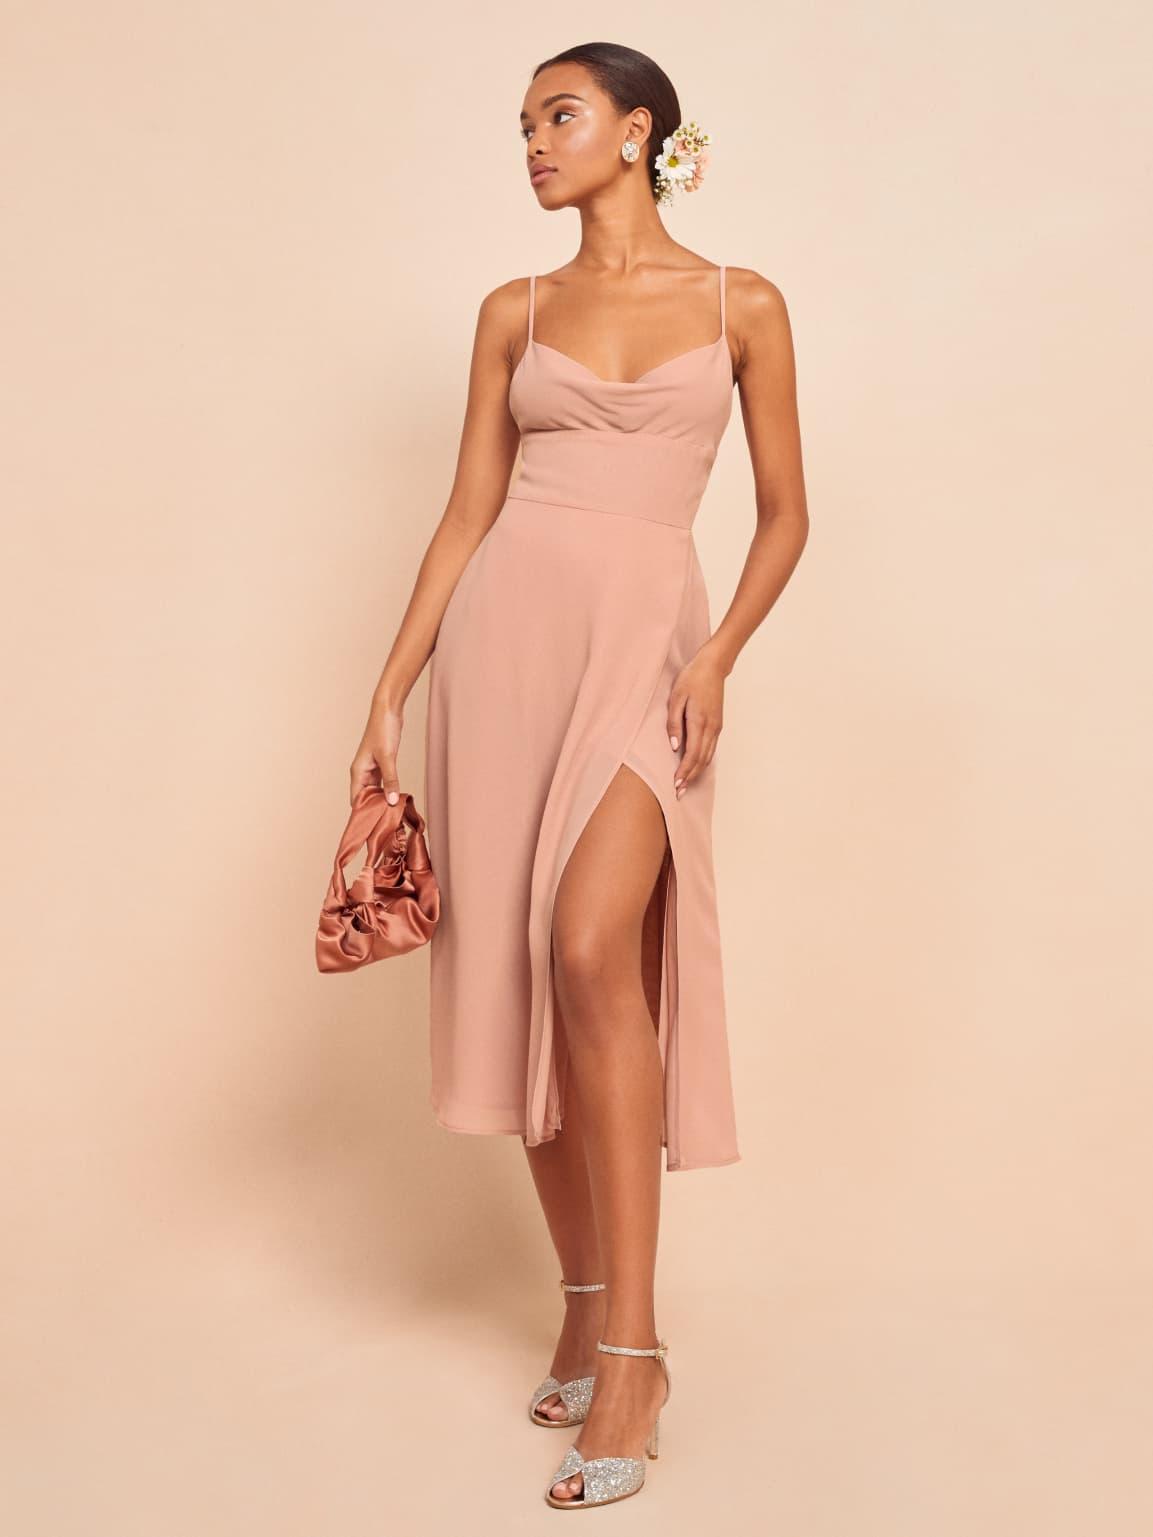 reformation gala bridesmaid dress, reformation wedding collection